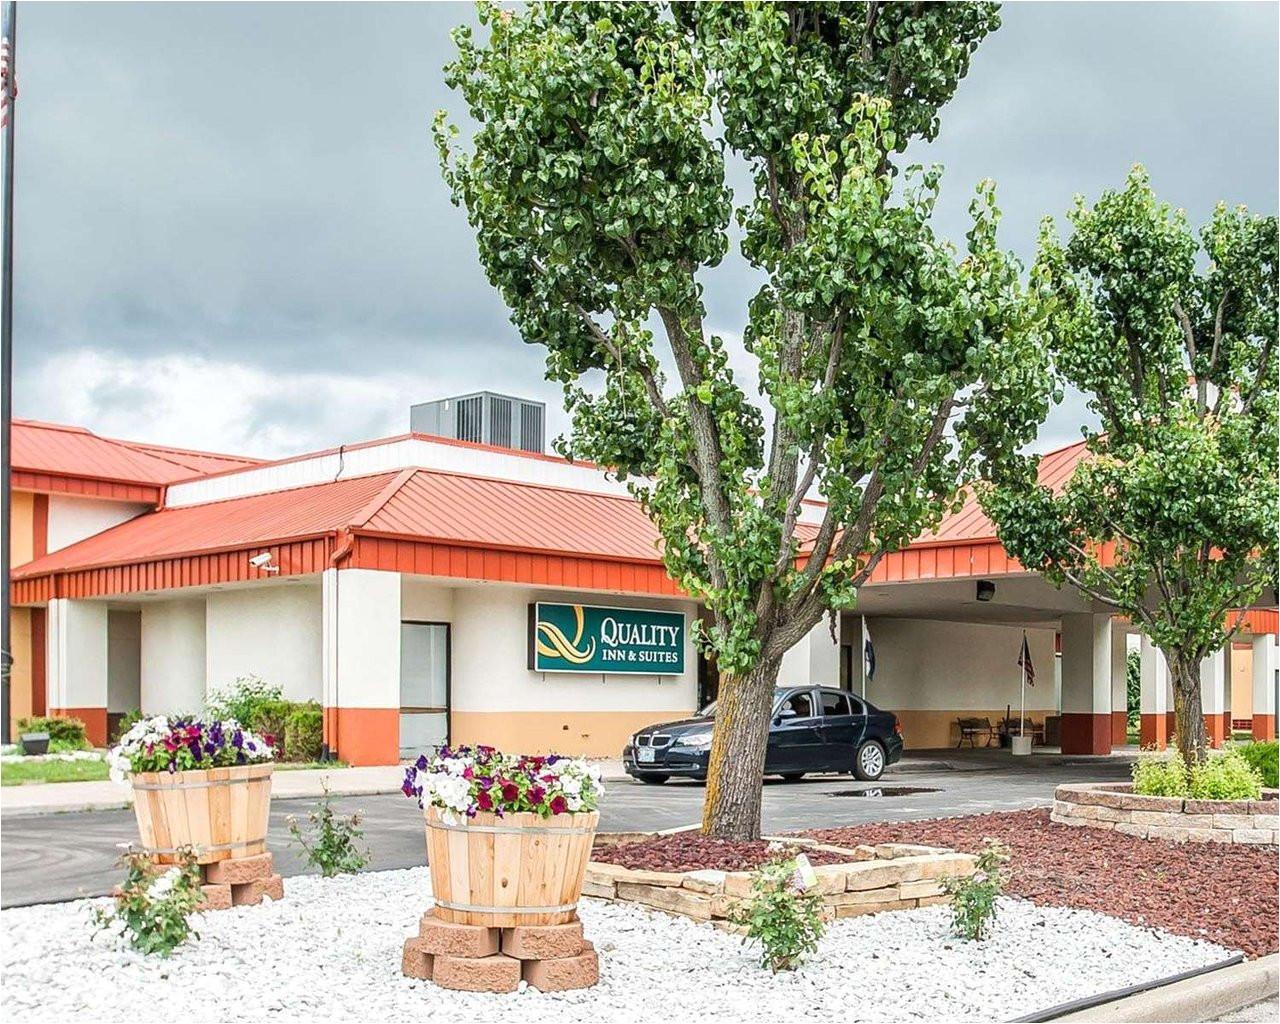 quality inn kansas city i 435n near sports complex 53 i 9i 2i updated 2019 prices hotel reviews mo tripadvisor